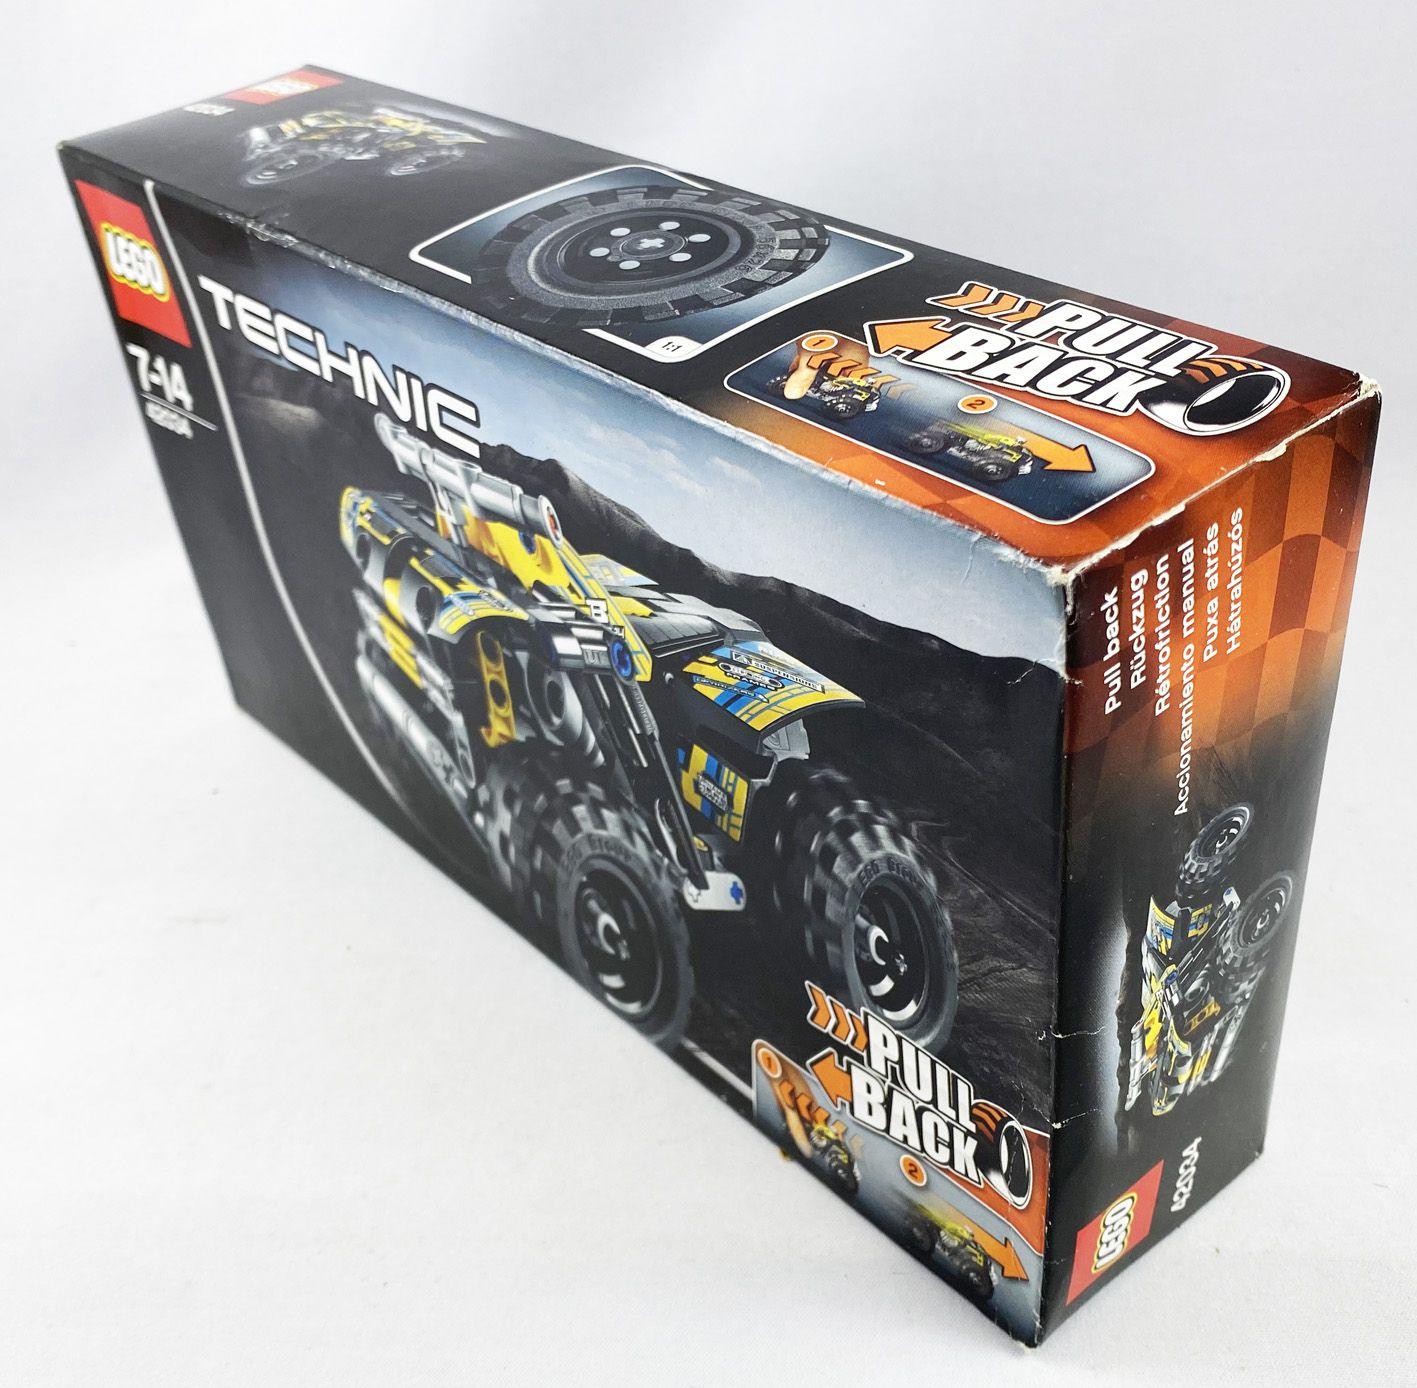 LEGO Technic Ref.42034 - Le Quad (Pull Back action)